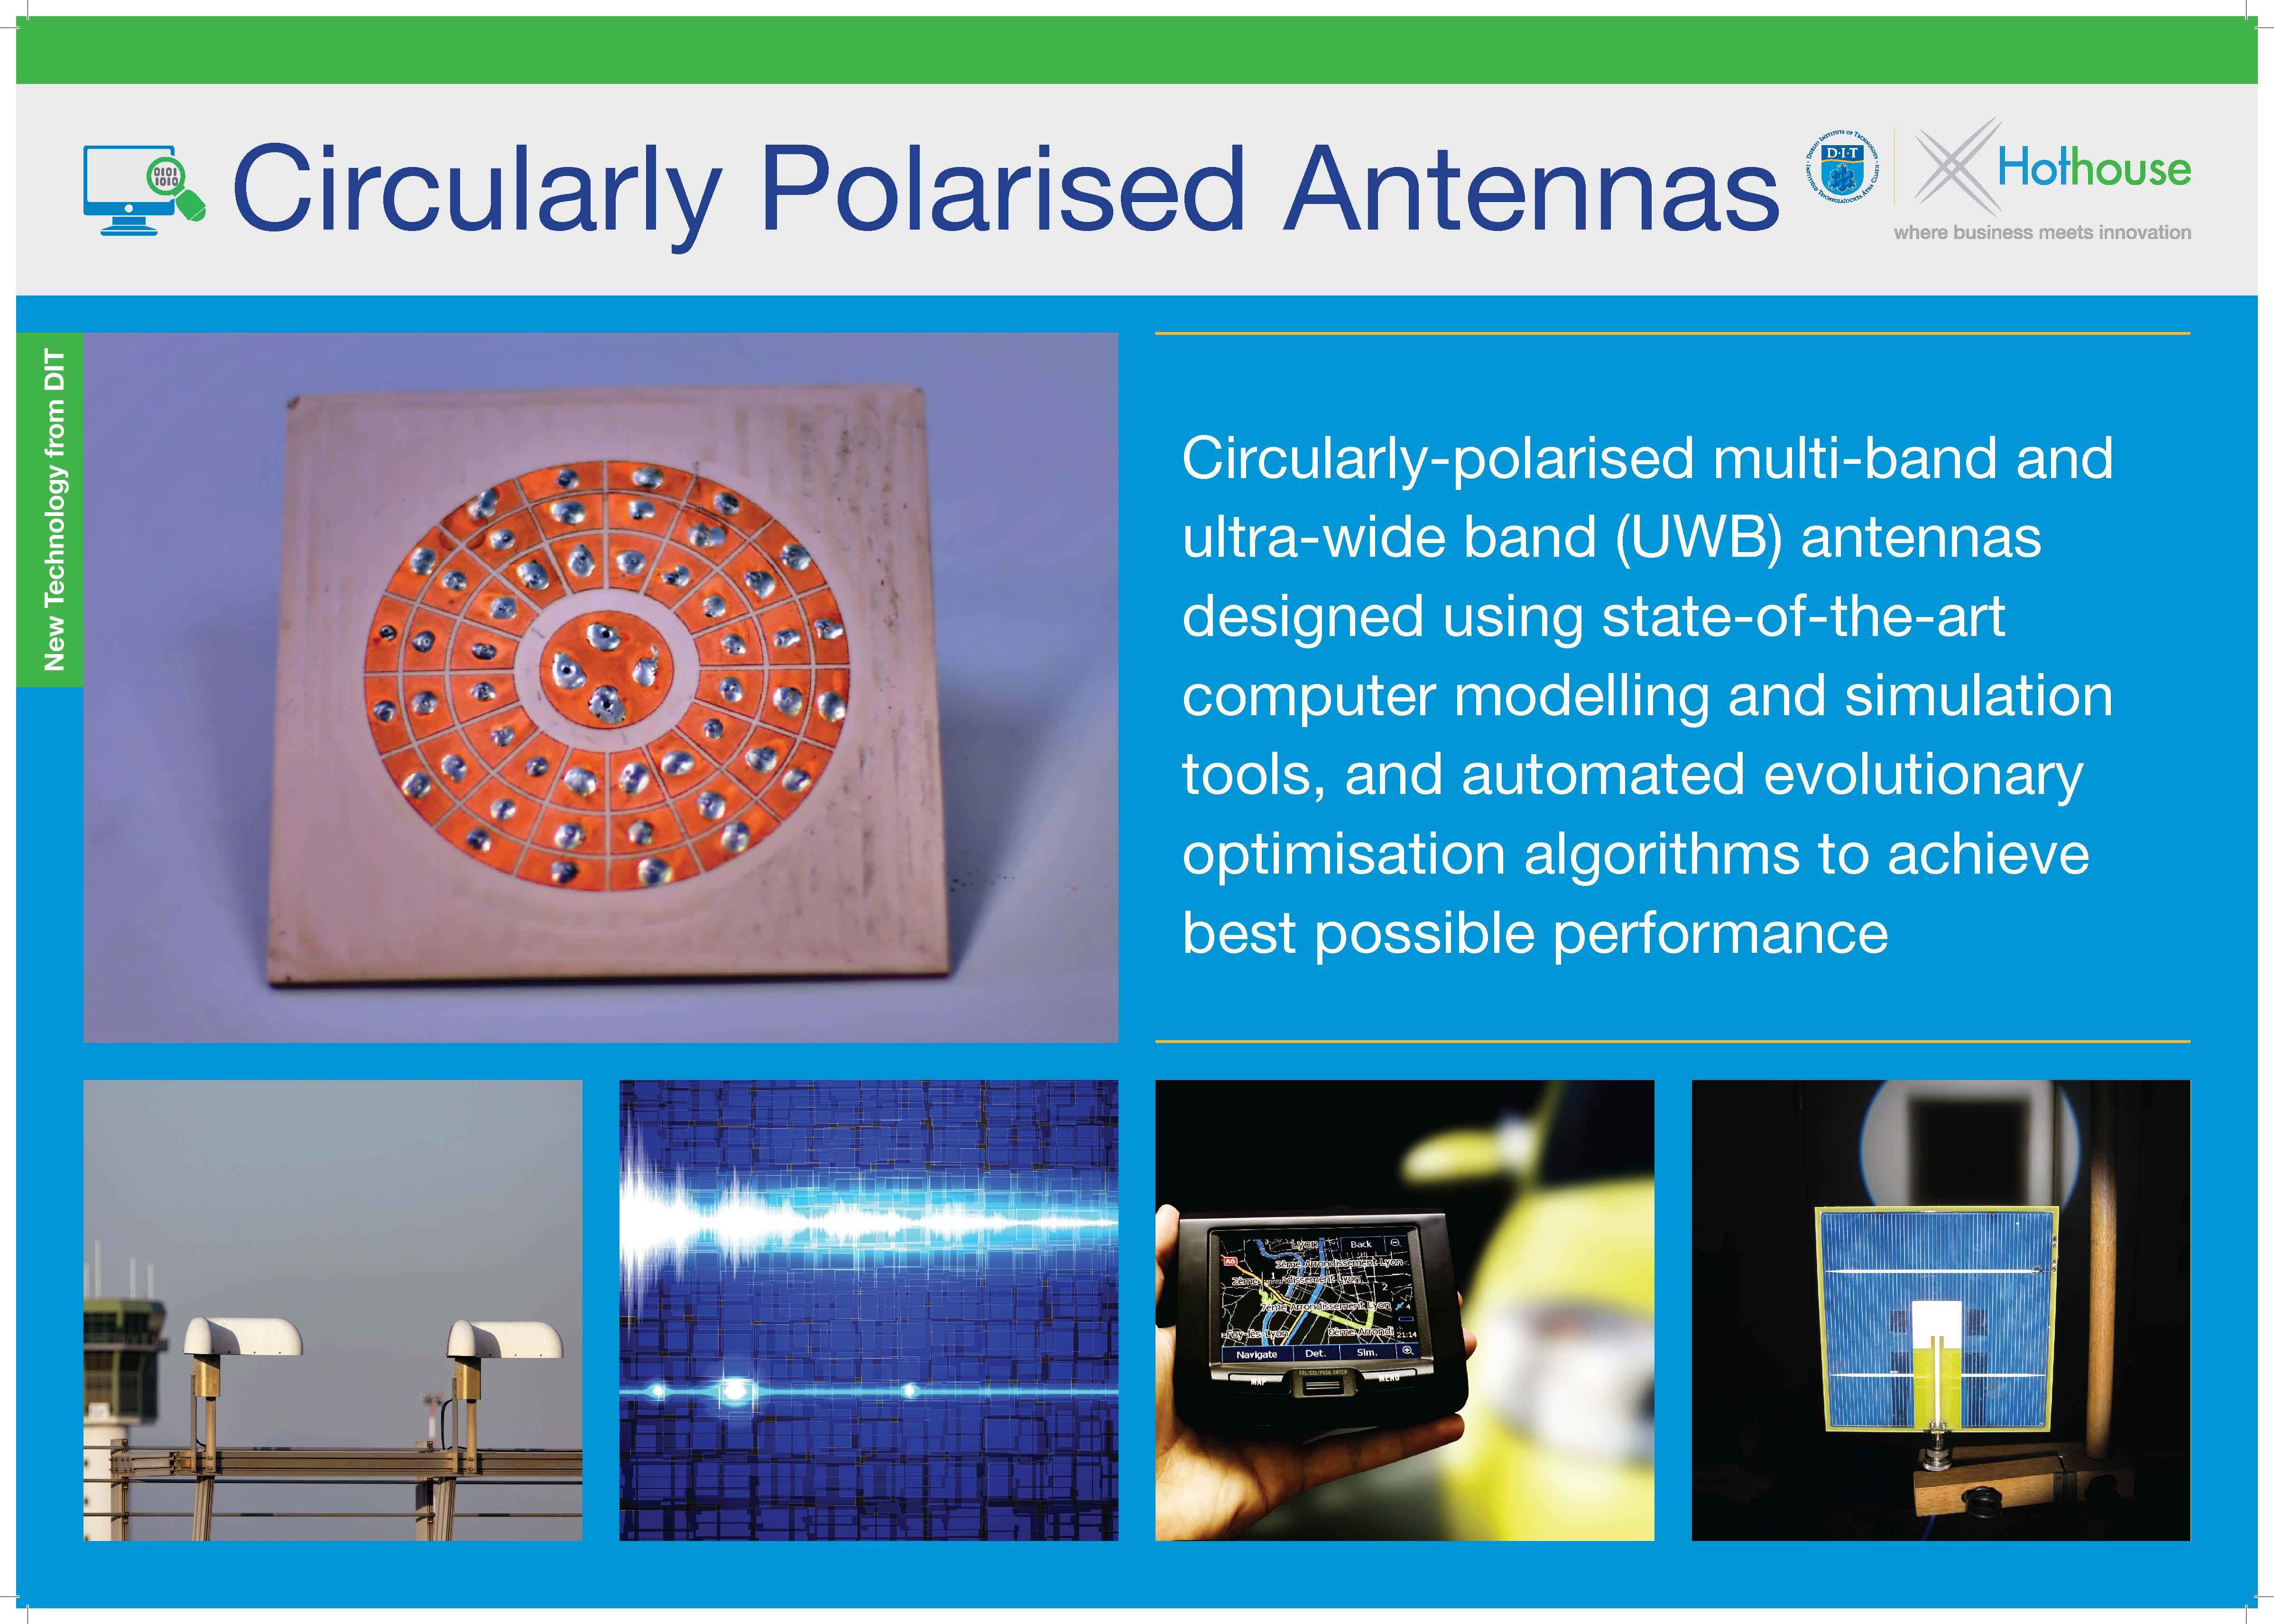 Circularly Polarised Antennas